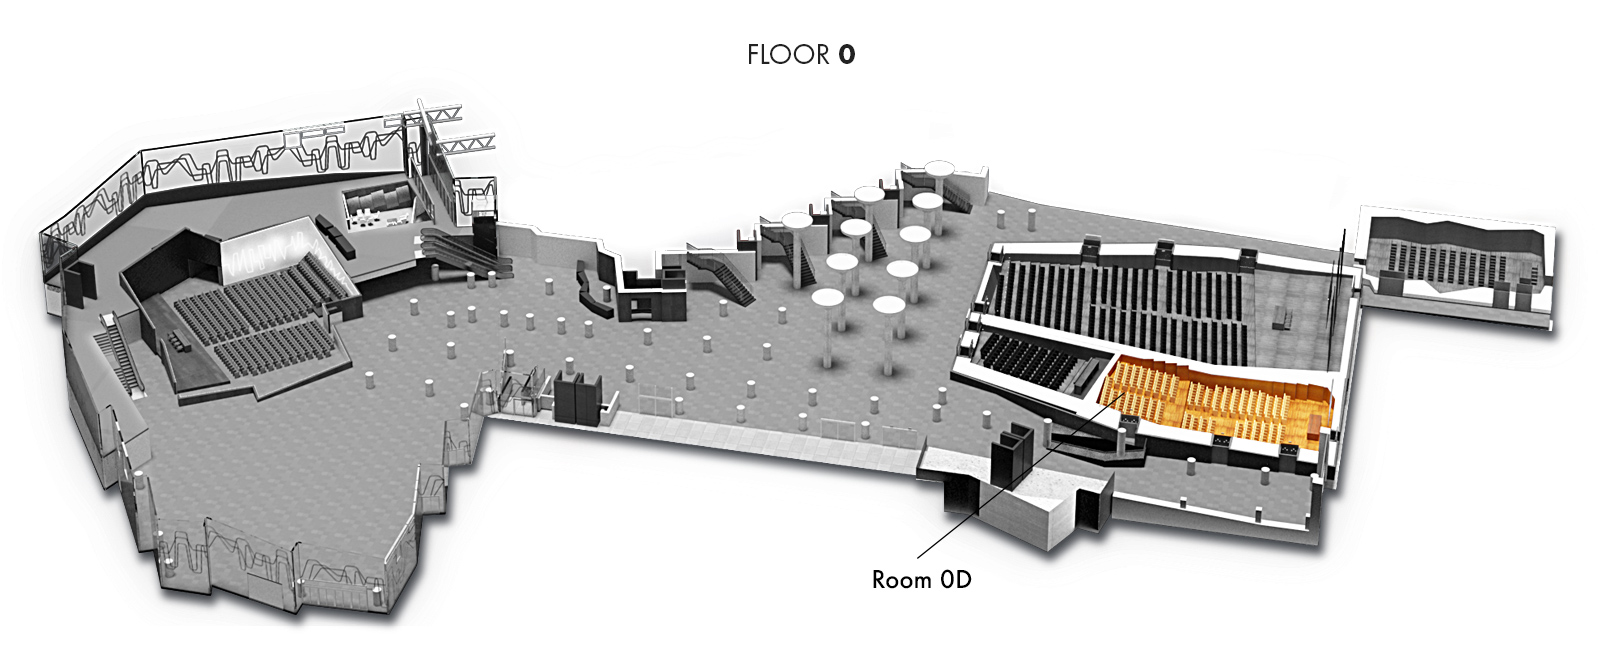 Room 0D, Floor 0 | Palacio Euskalduna Jauregia